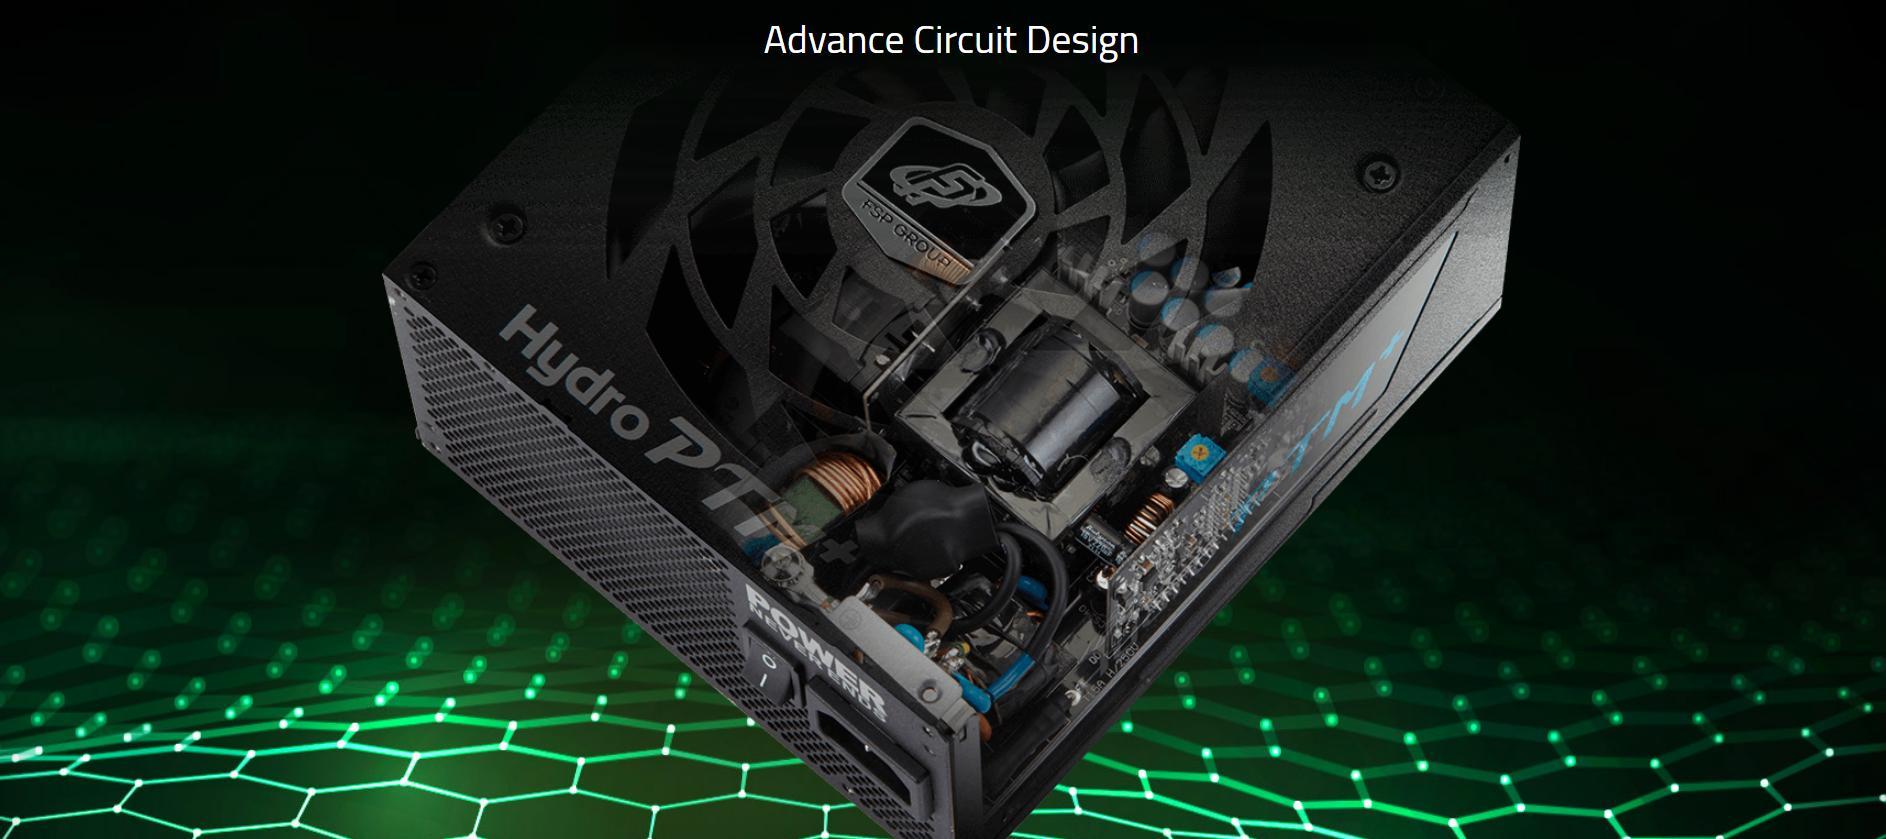 Nguồn FSP HYDRO PTM+ Series 850W - Active PFC - 80 Plus Platinum - Full Modular giới thiệu 5